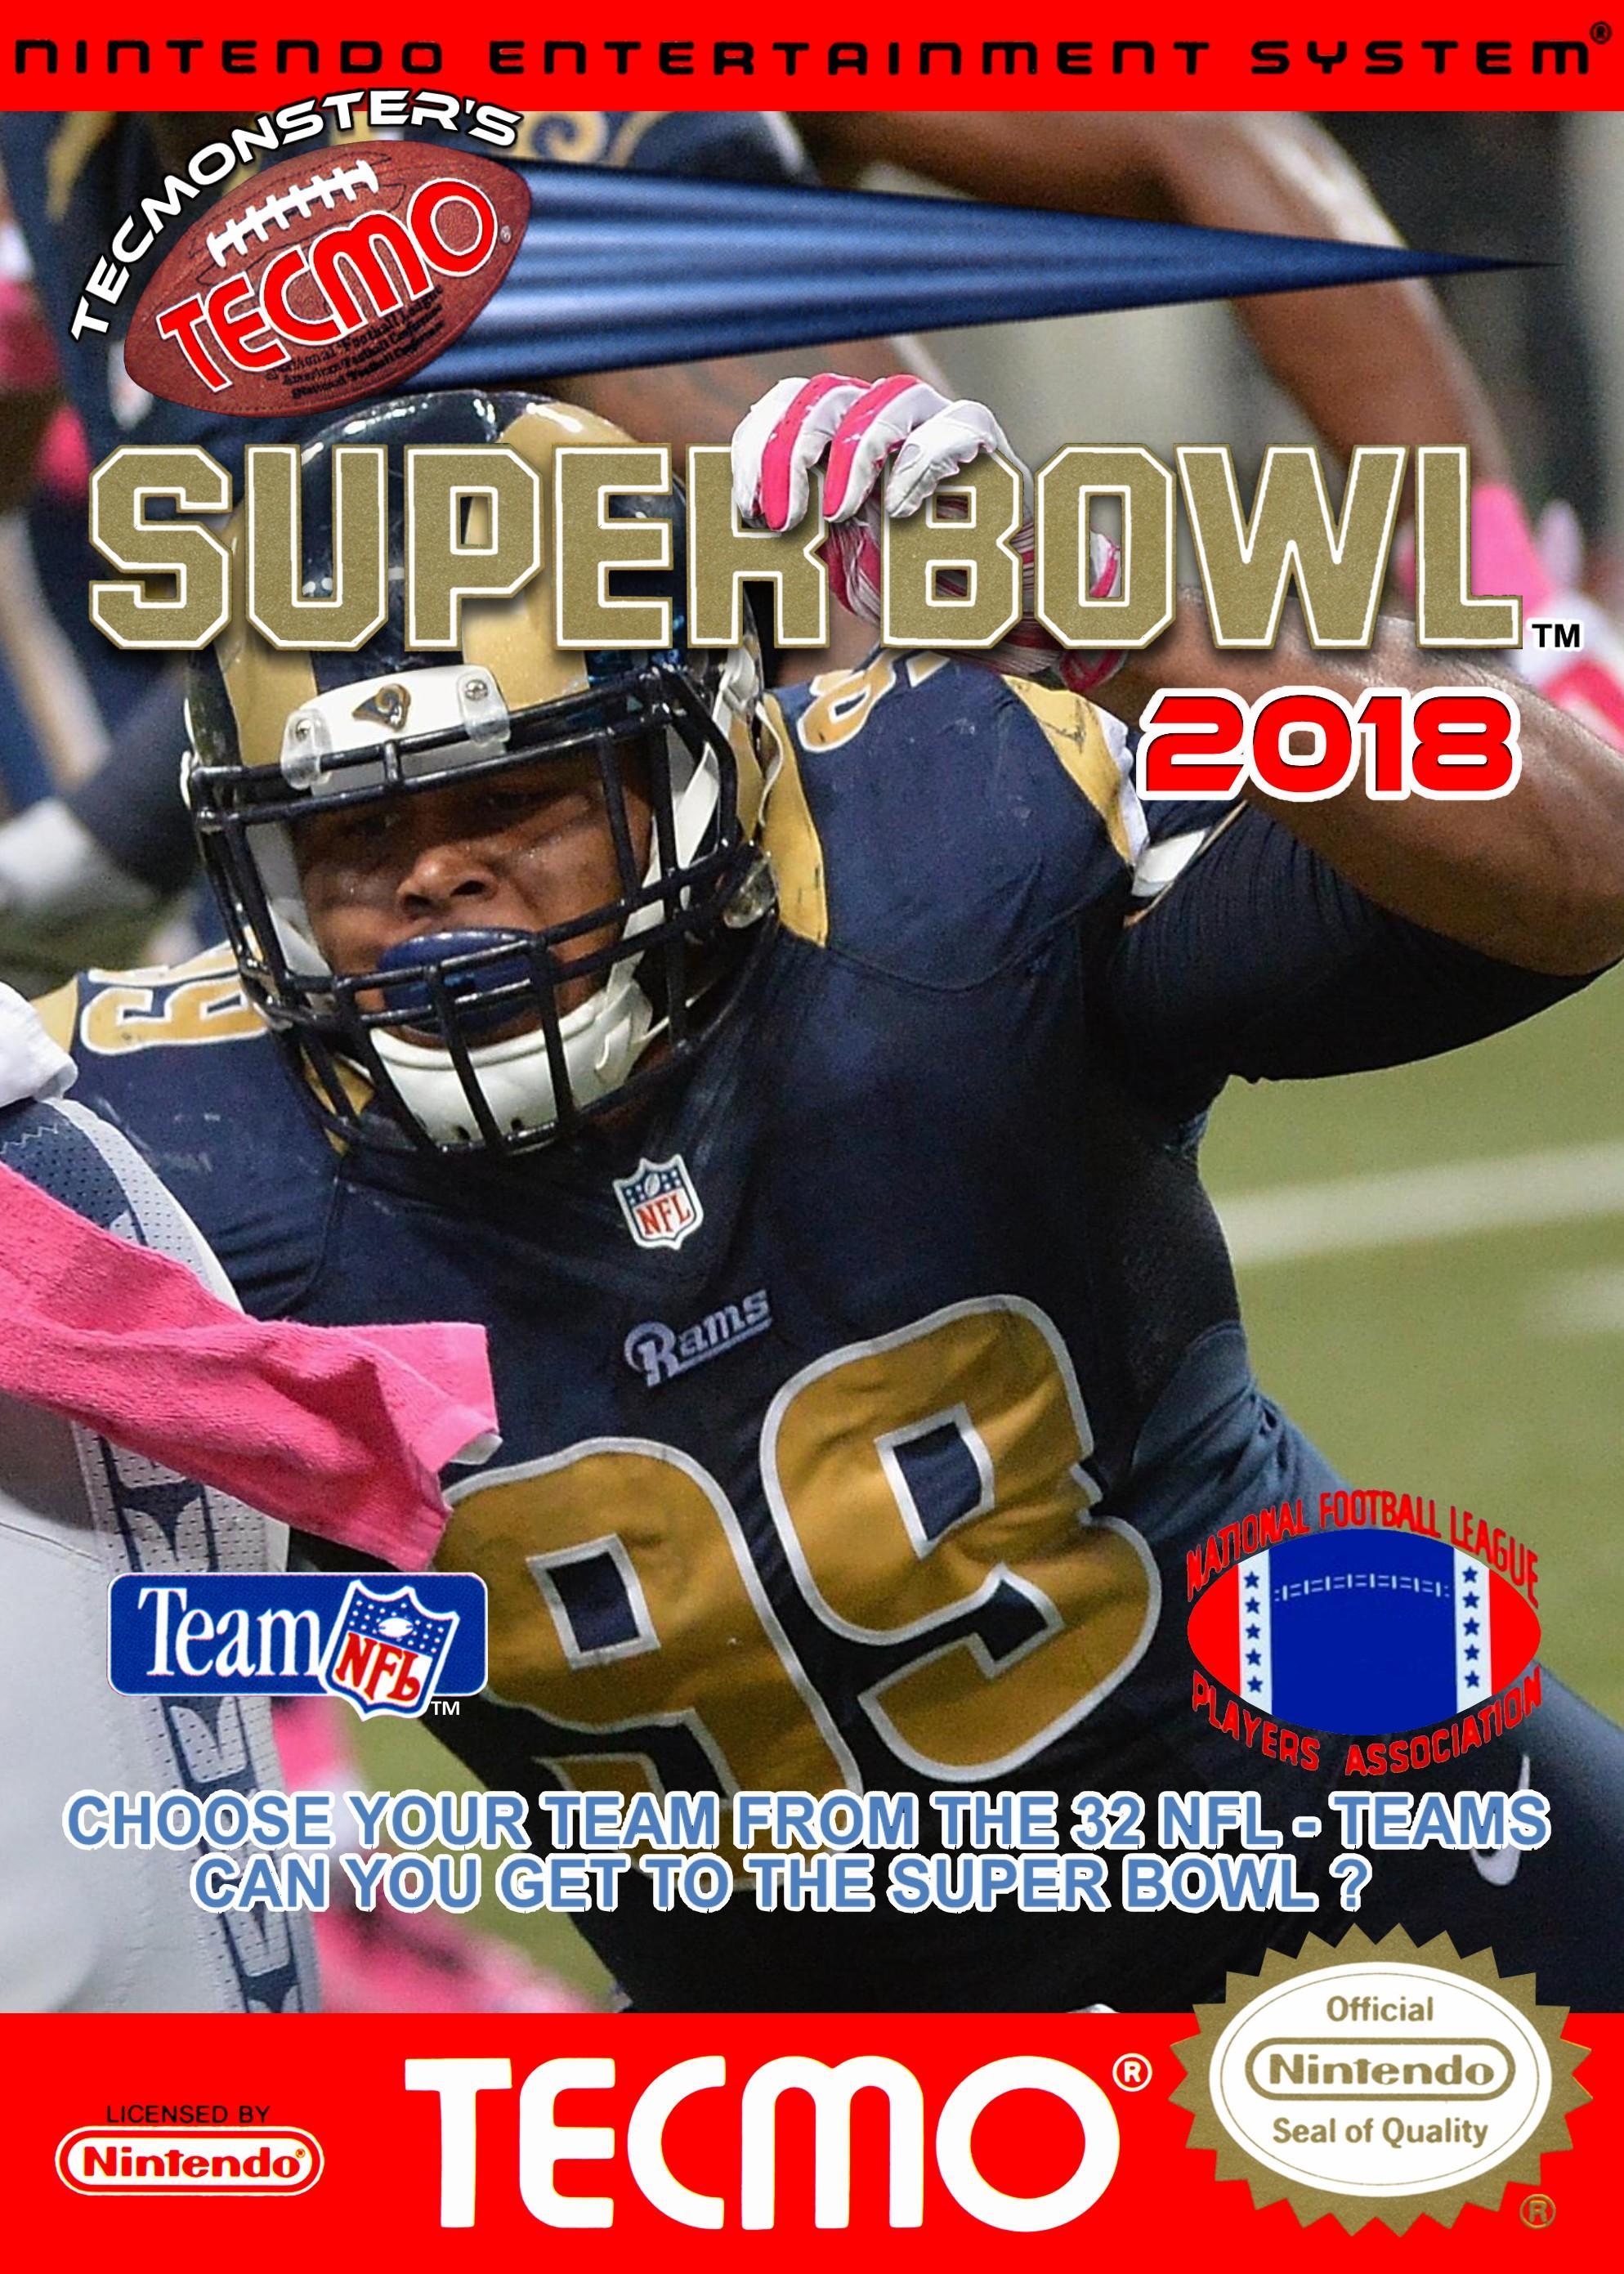 Tecmonster's Tecmo Super Bowl 2018